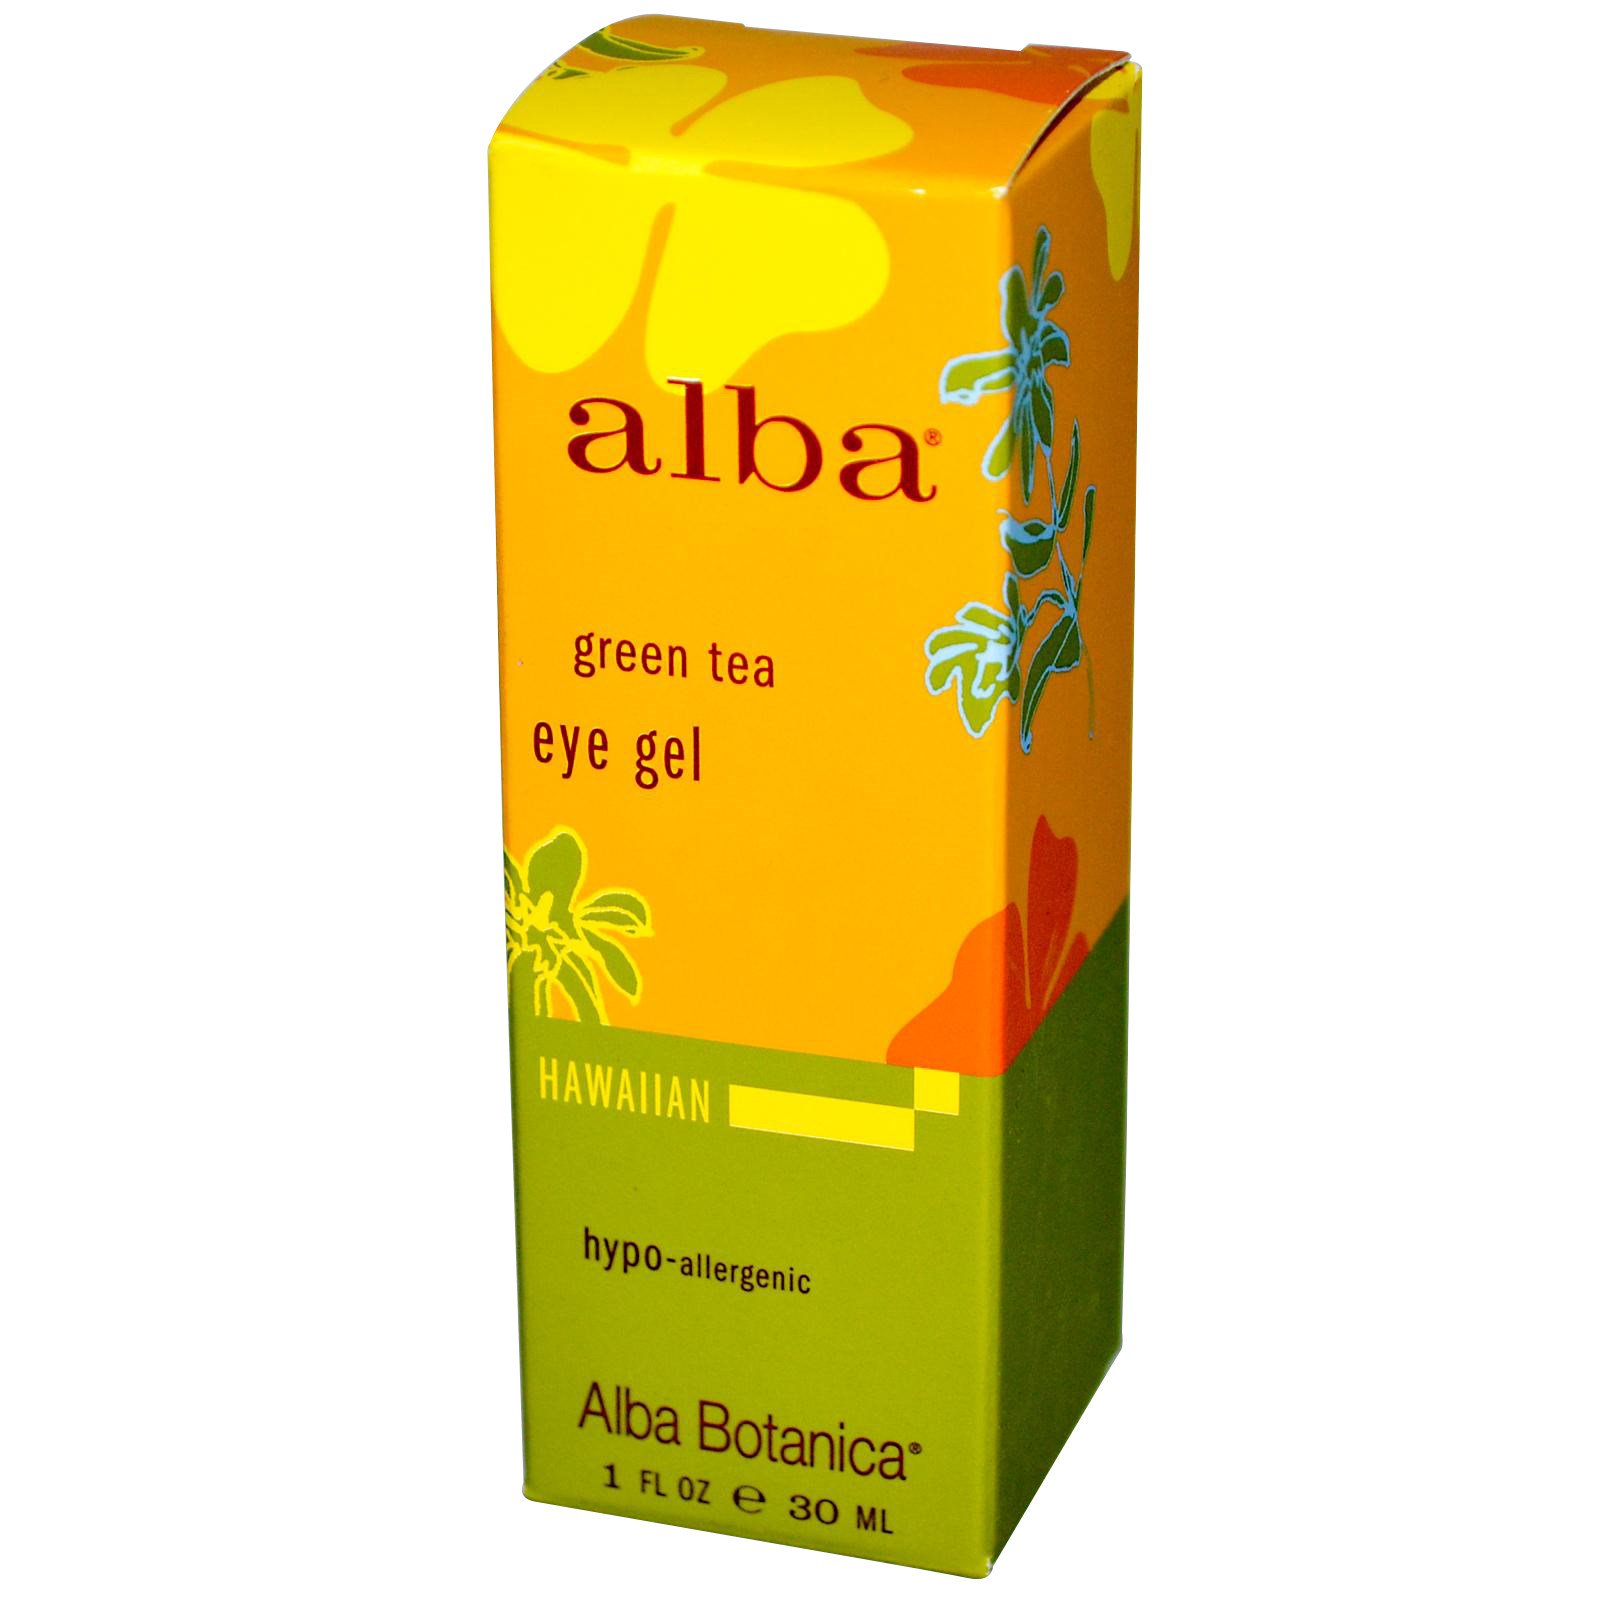 6 Pack - Alba Botanica Hawaiian Eye Gel, Revitalizing Green Tea 1 oz Alba Botanica, Good & Clean, Gentle Acne Wash, 6 oz (pack of 6)